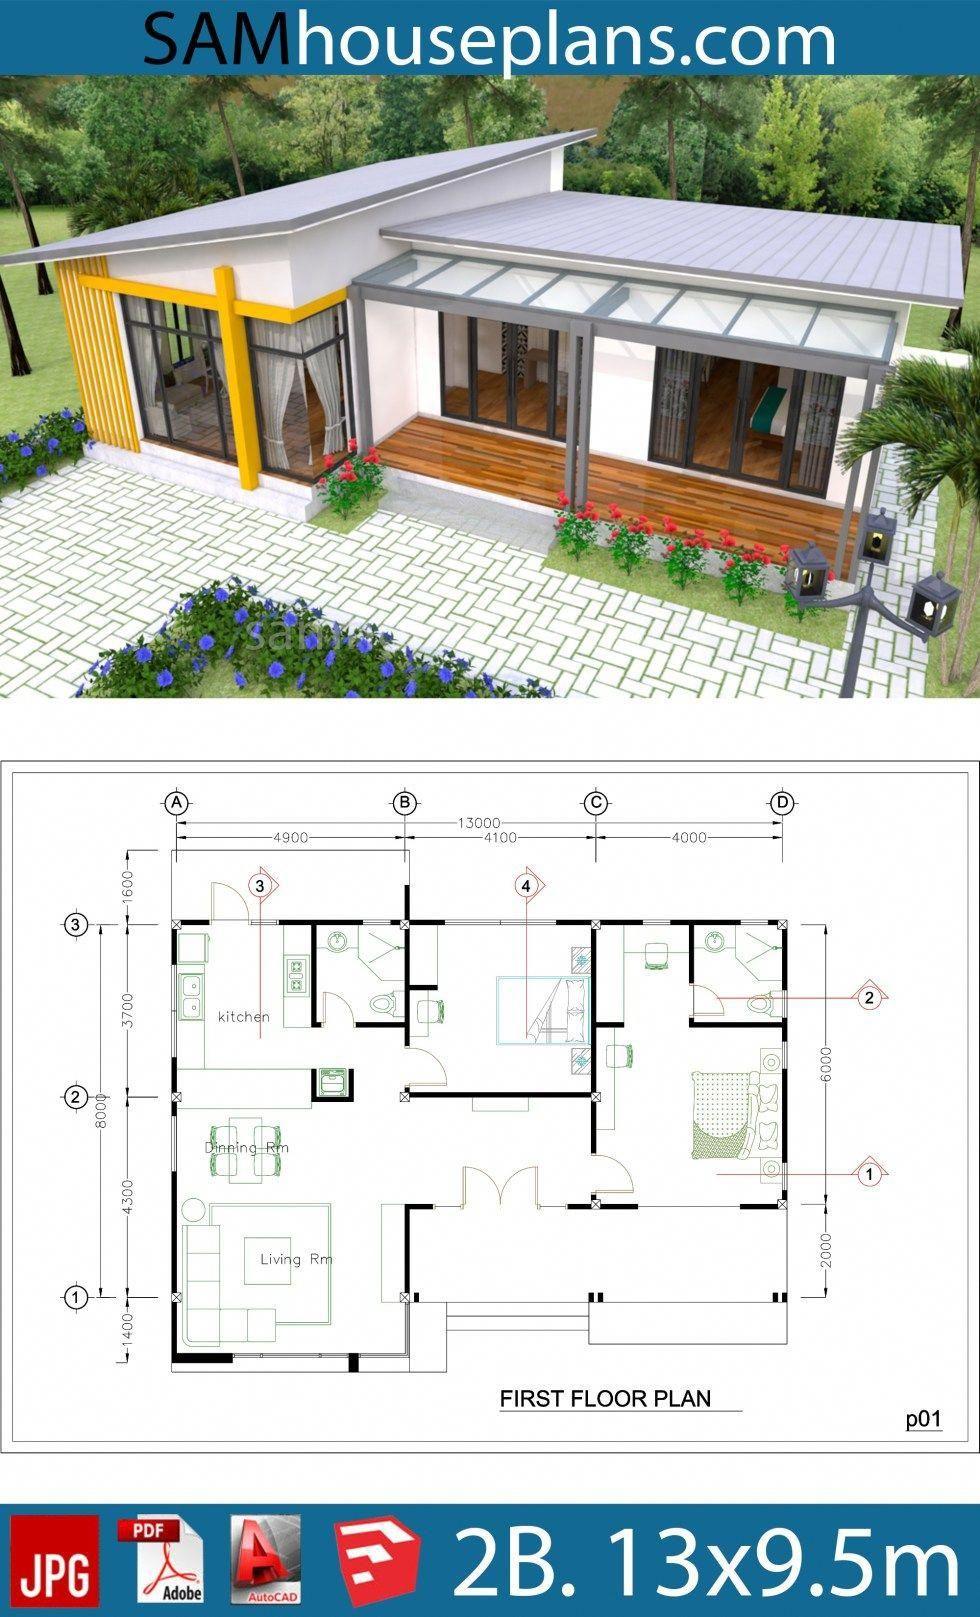 Dream Houses Dreamhouses Small House Design Plans Simple House Design Sims House Plans